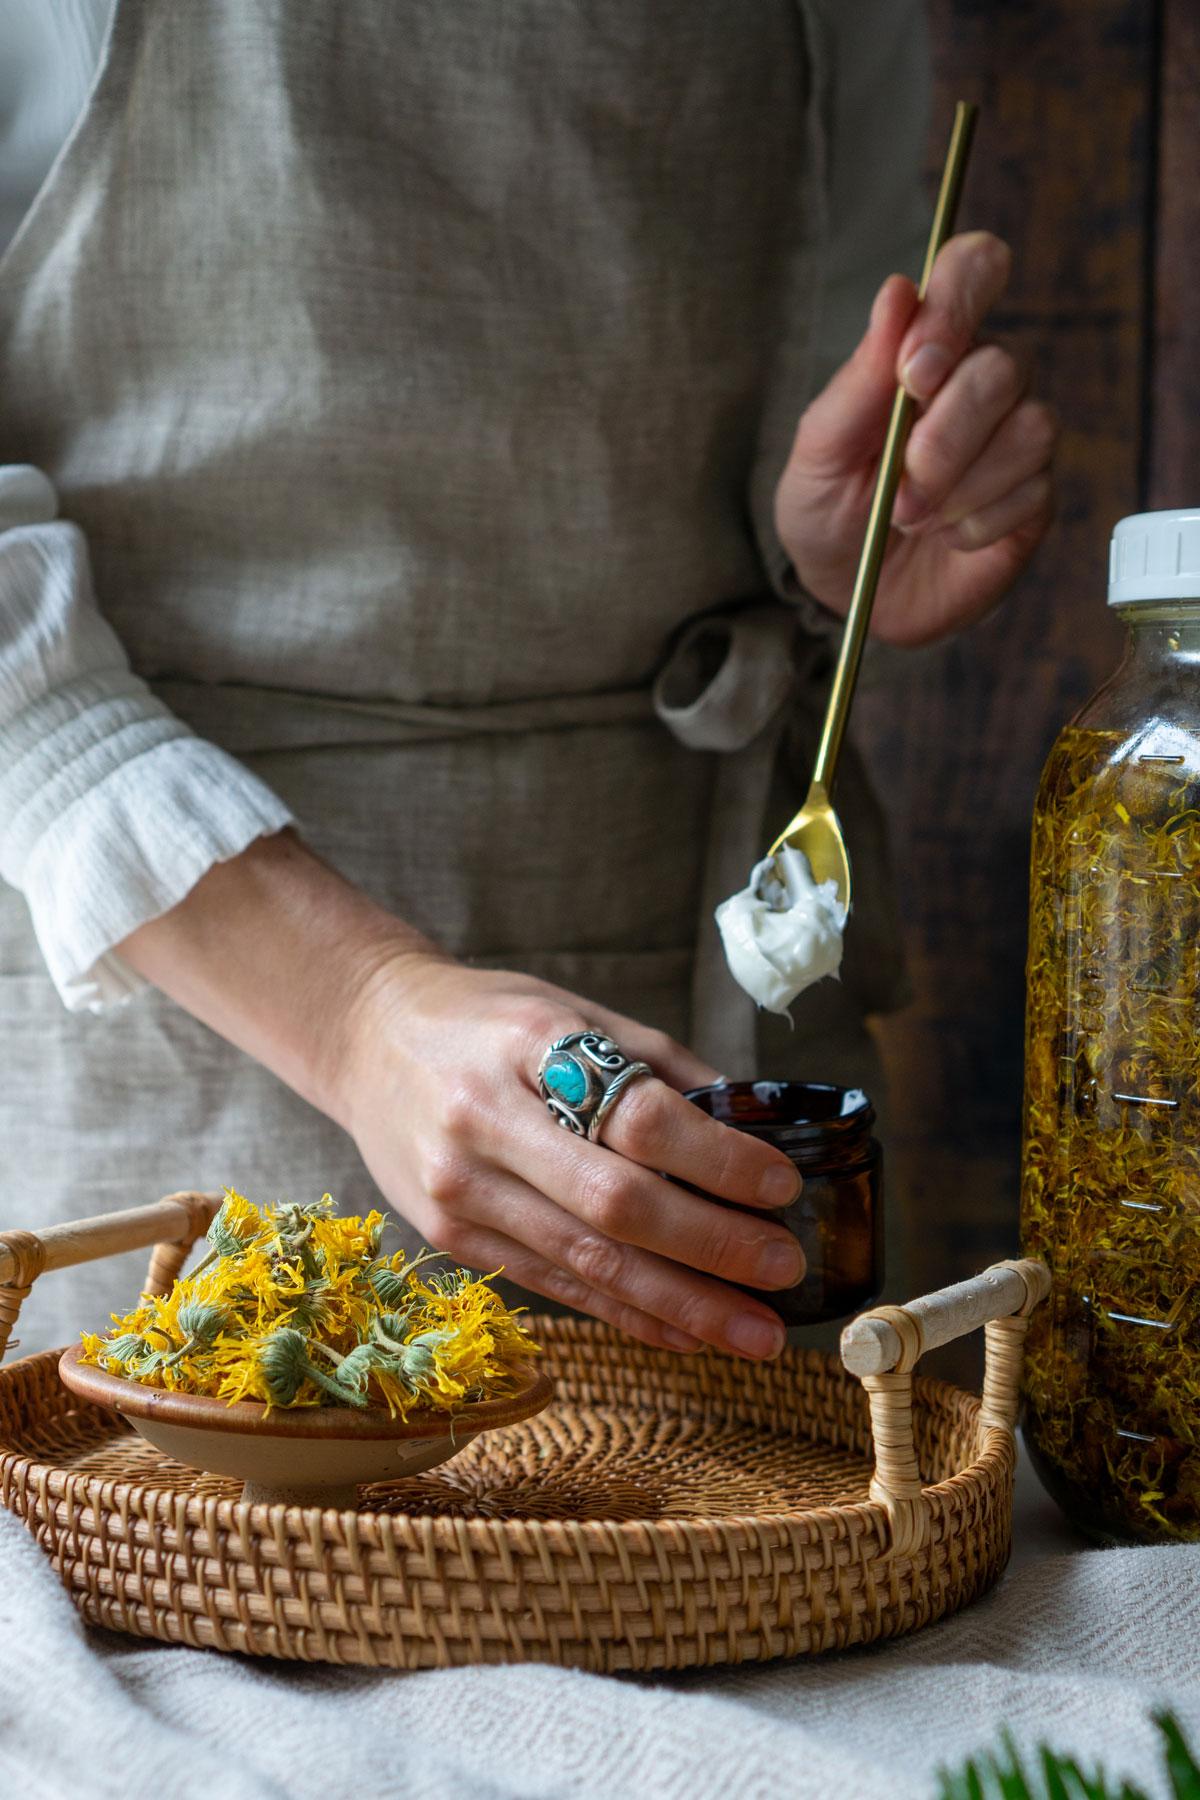 making a shelf-stable calendula cream recipe